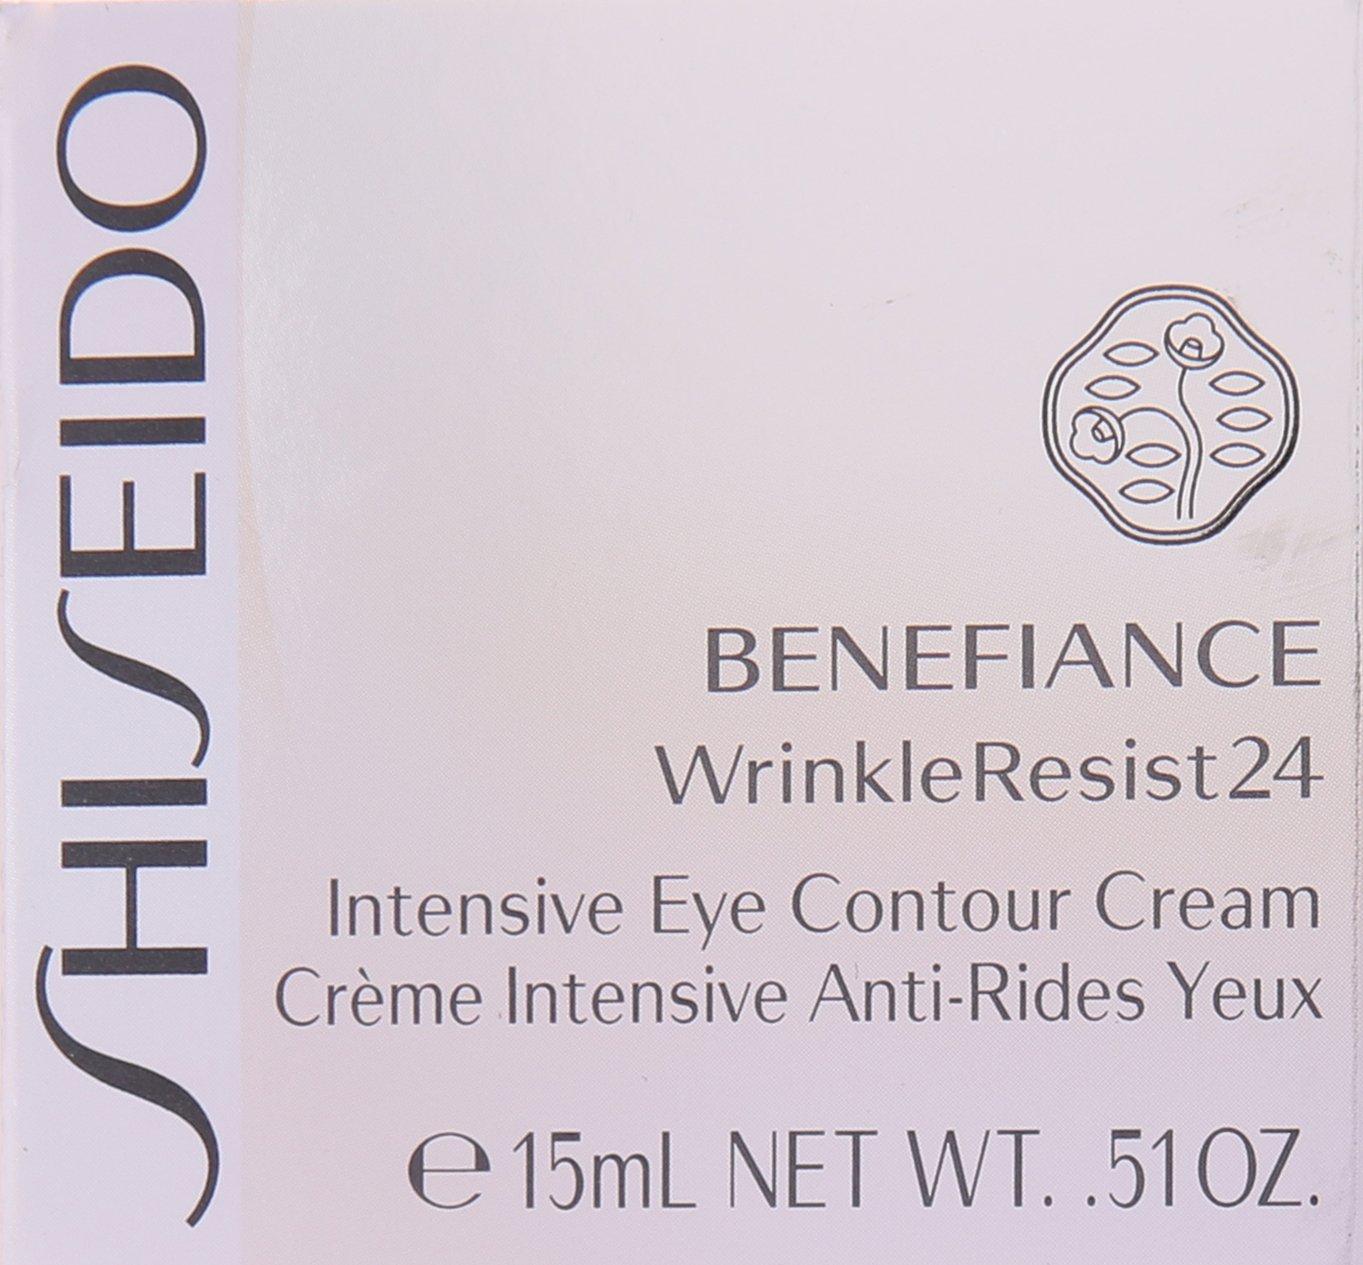 Shiseido Benefiance Wrinkle Resist24 Intensive Eye Contour Cream for Unisex, 0.51 Ounce by Shiseido